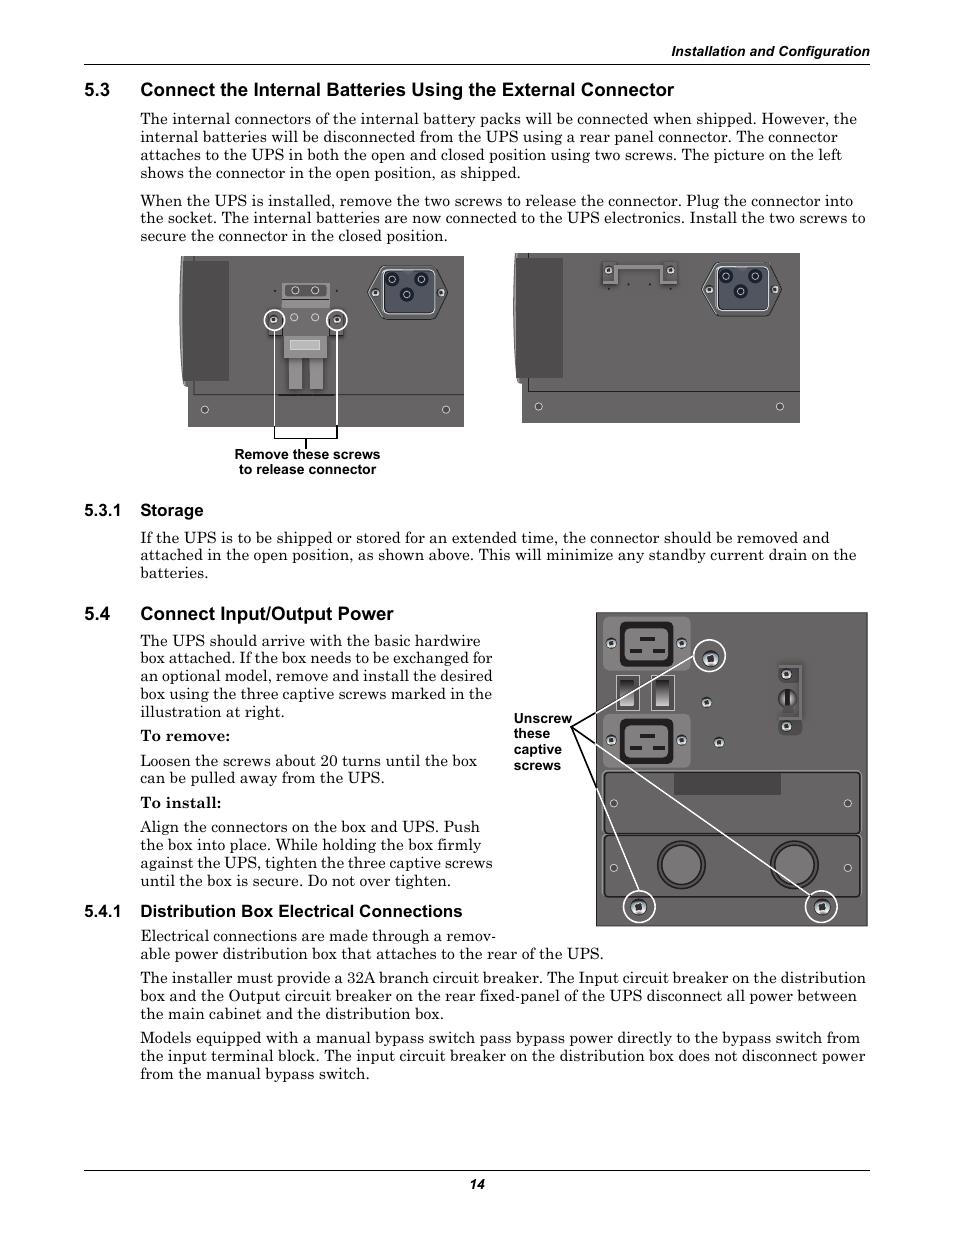 1 storage, 4 connect input/output power, 1 distribution box ...